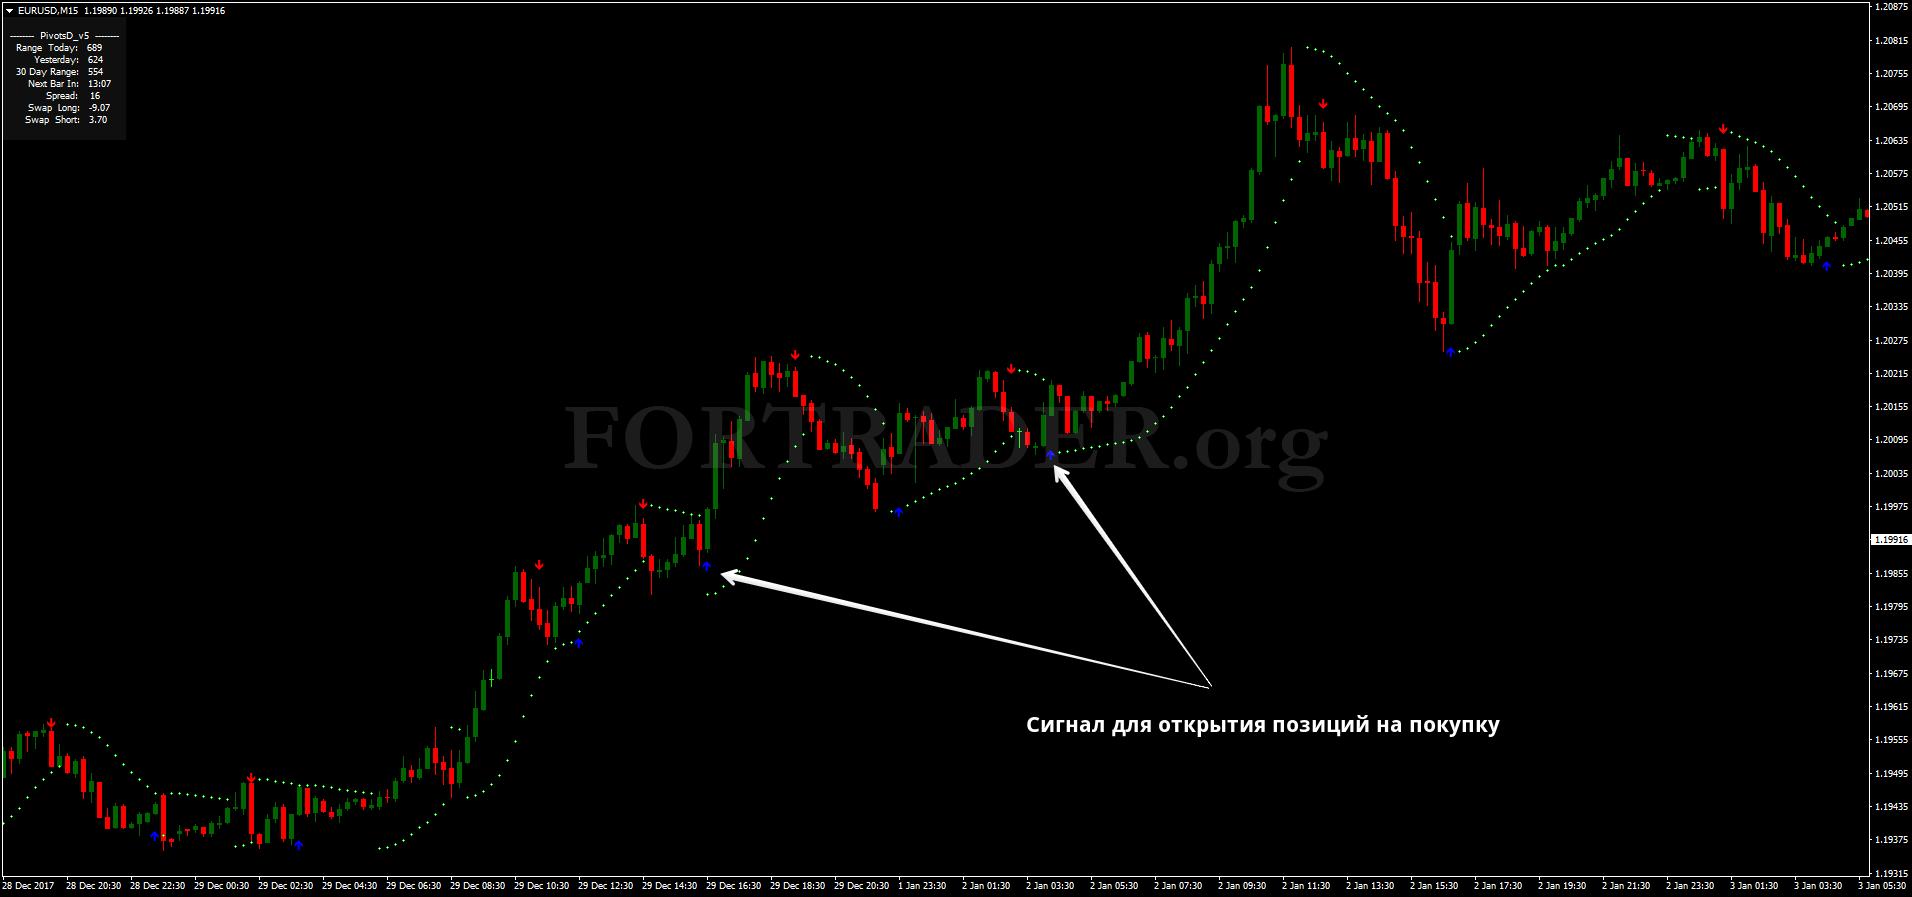 Forex книга внутридневной торговли прогноз форекс на сутки вперед